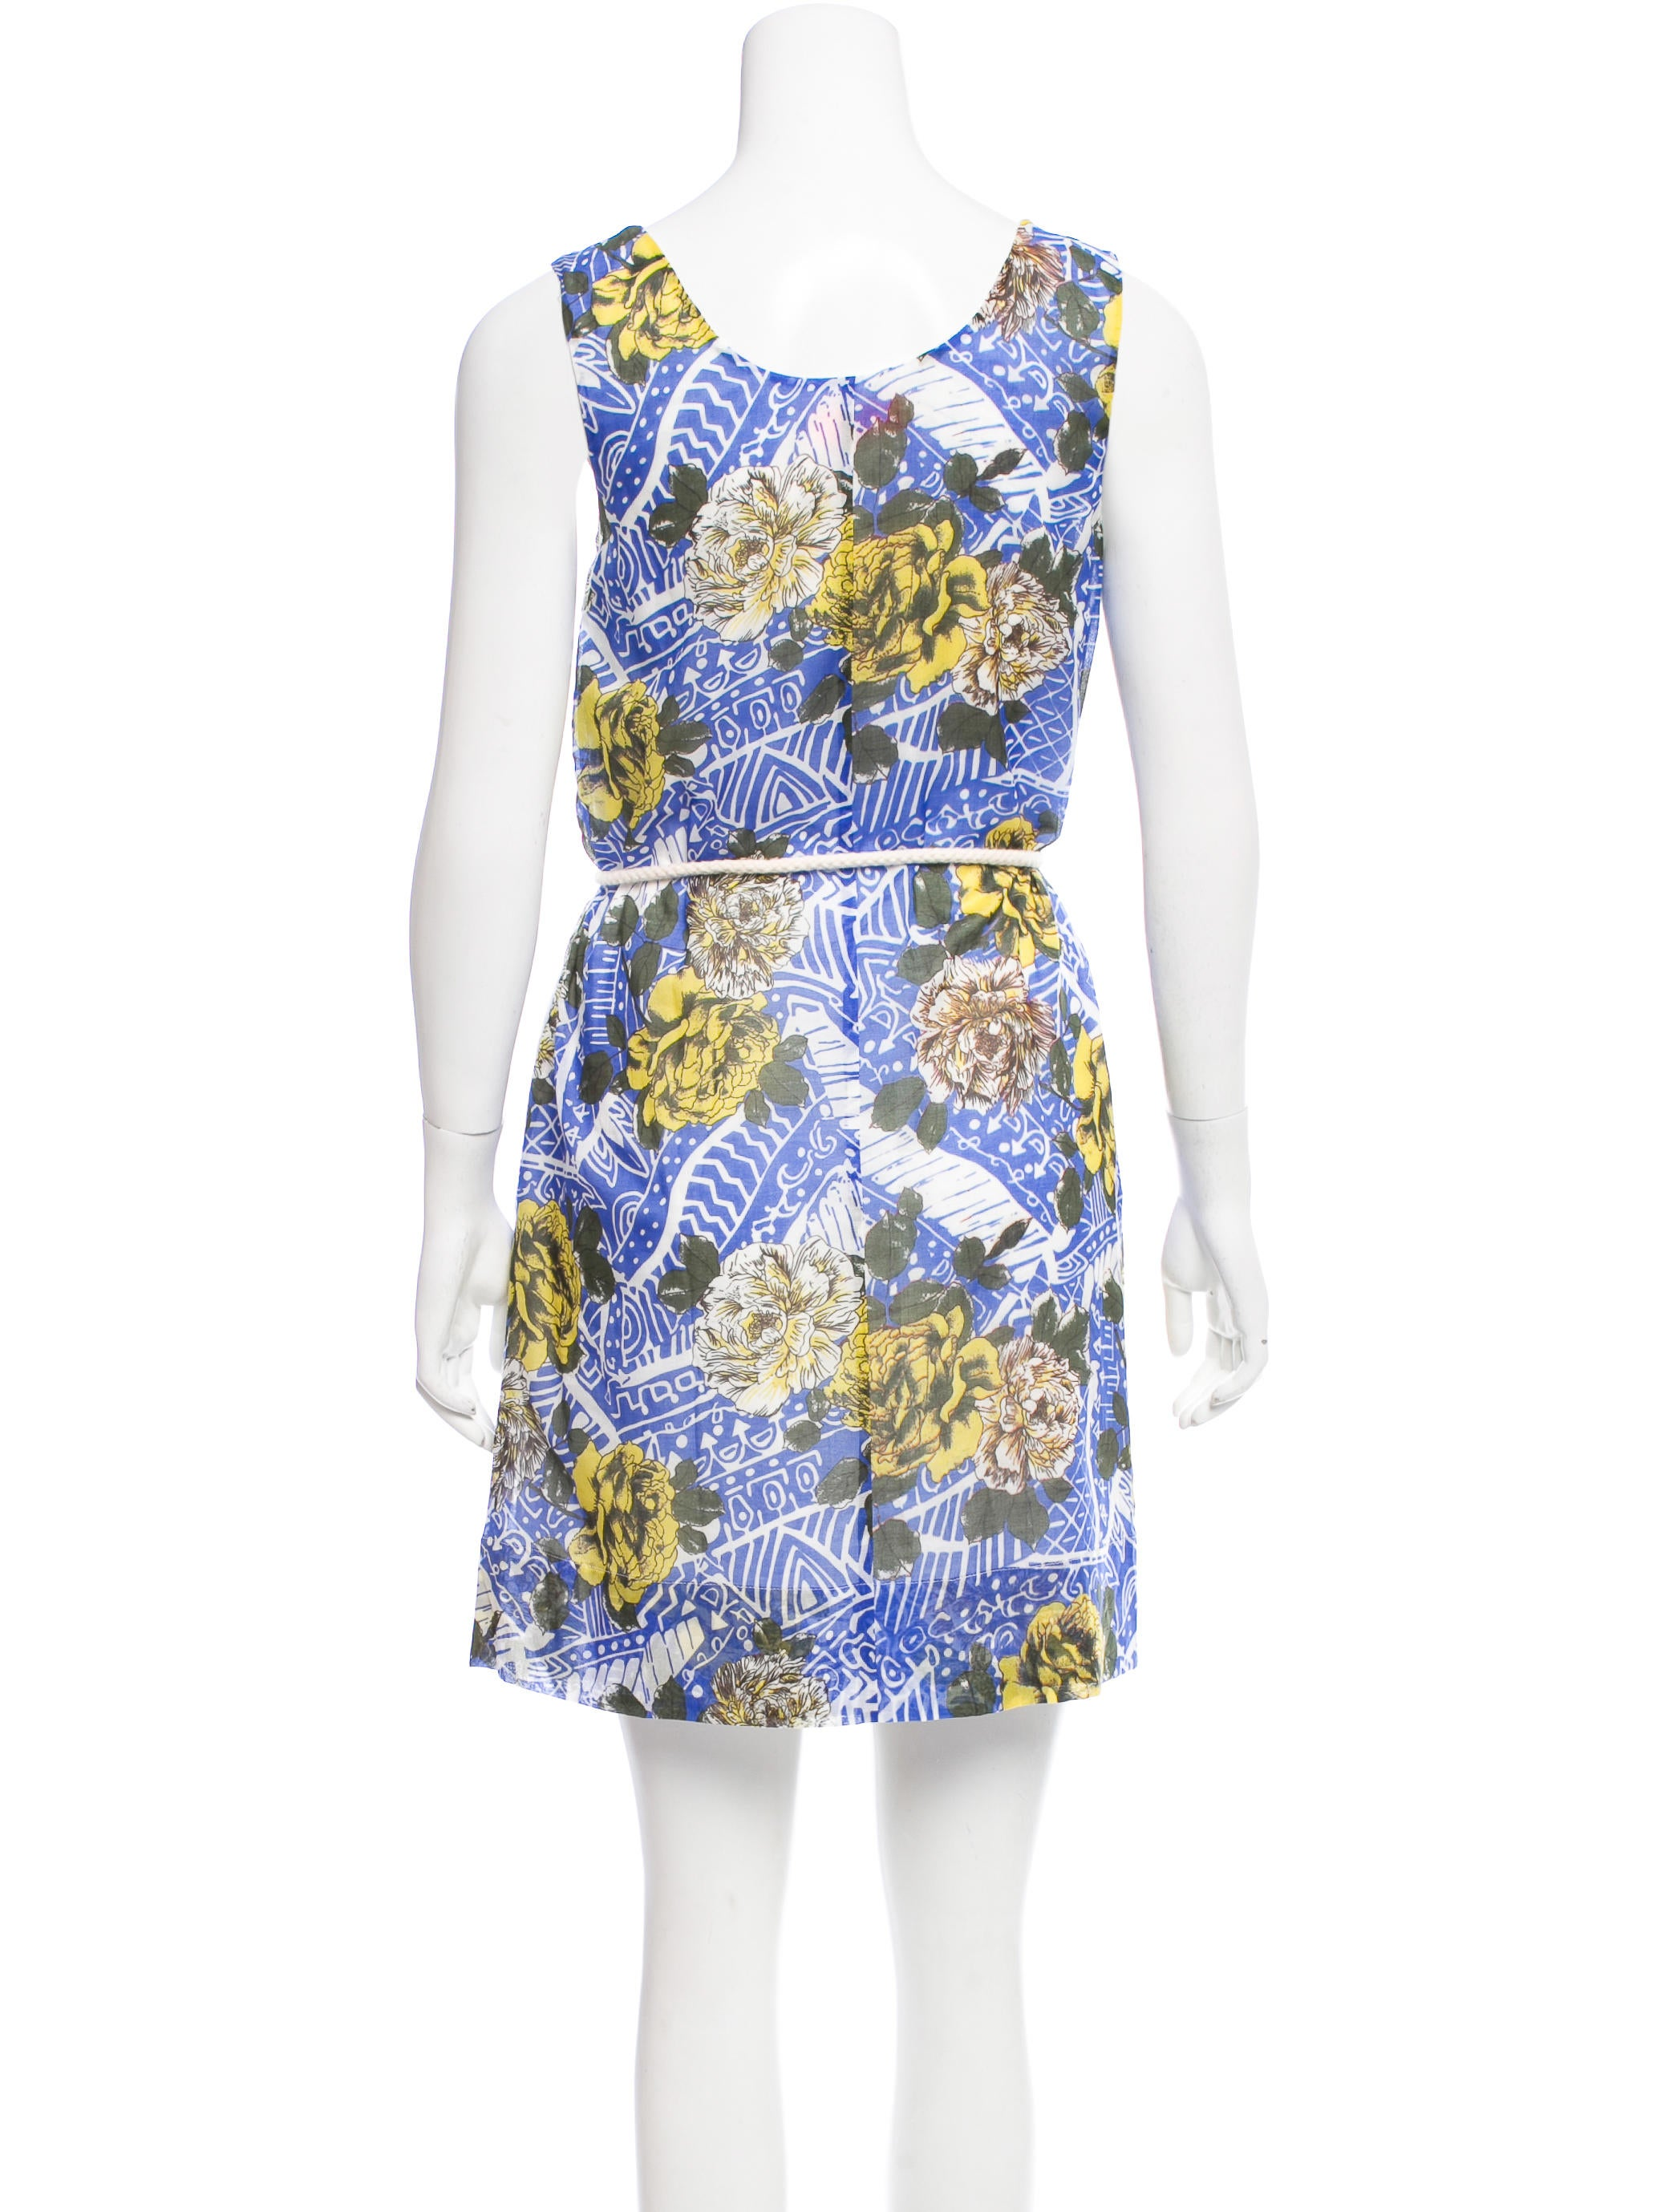 mw matthew williamson belted floral dress w tags